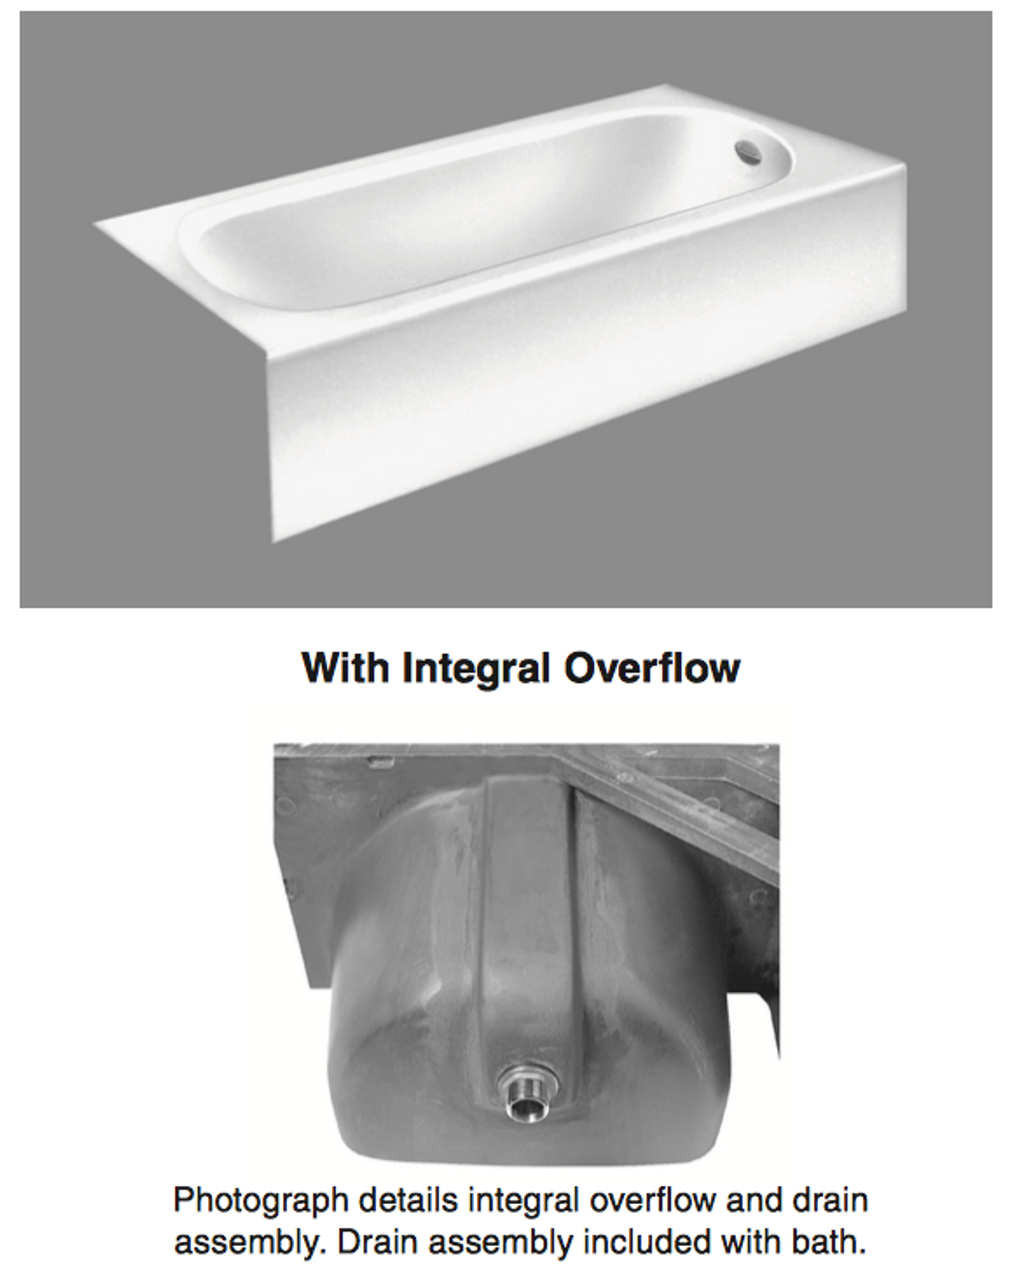 American Standard Princeton 60 Inch By 30 Inch Integral Apron Bathtub Above Floor Rough In Royal Bath Place